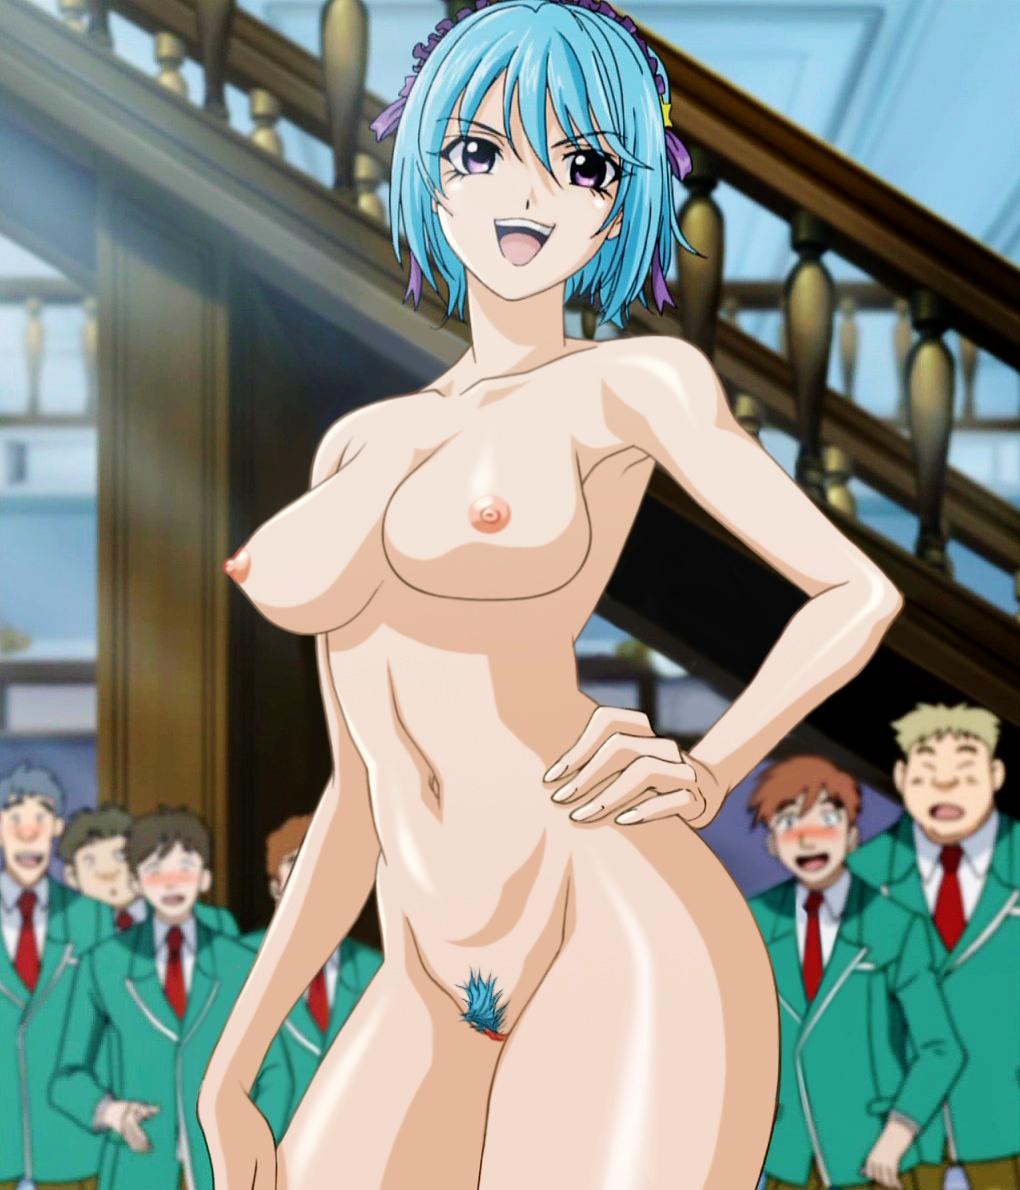 Nude female anime vampires naked comic